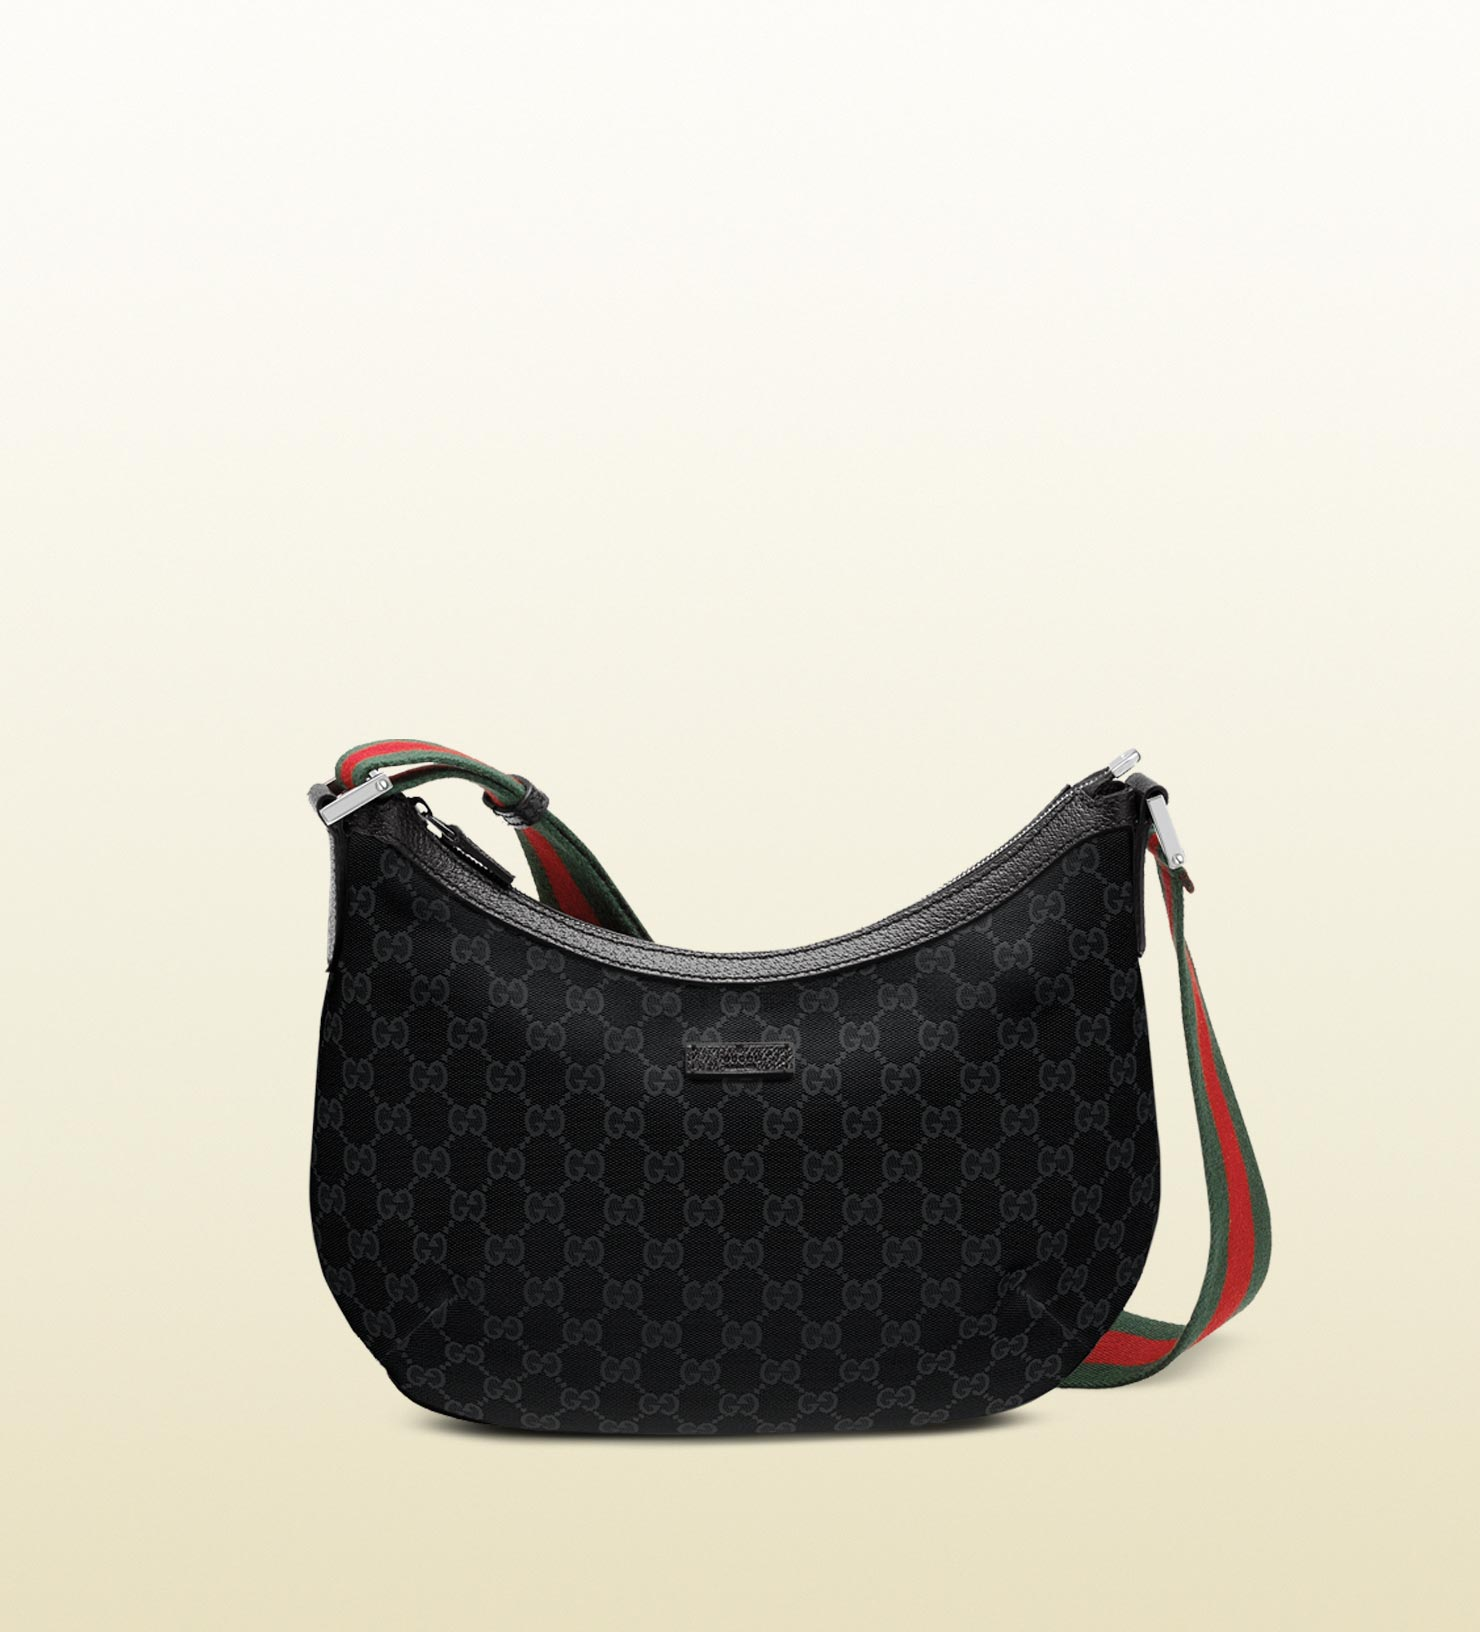 e25f2fbafe4d Gucci Original Gg Canvas Messenger Bag in Black for Men - Lyst